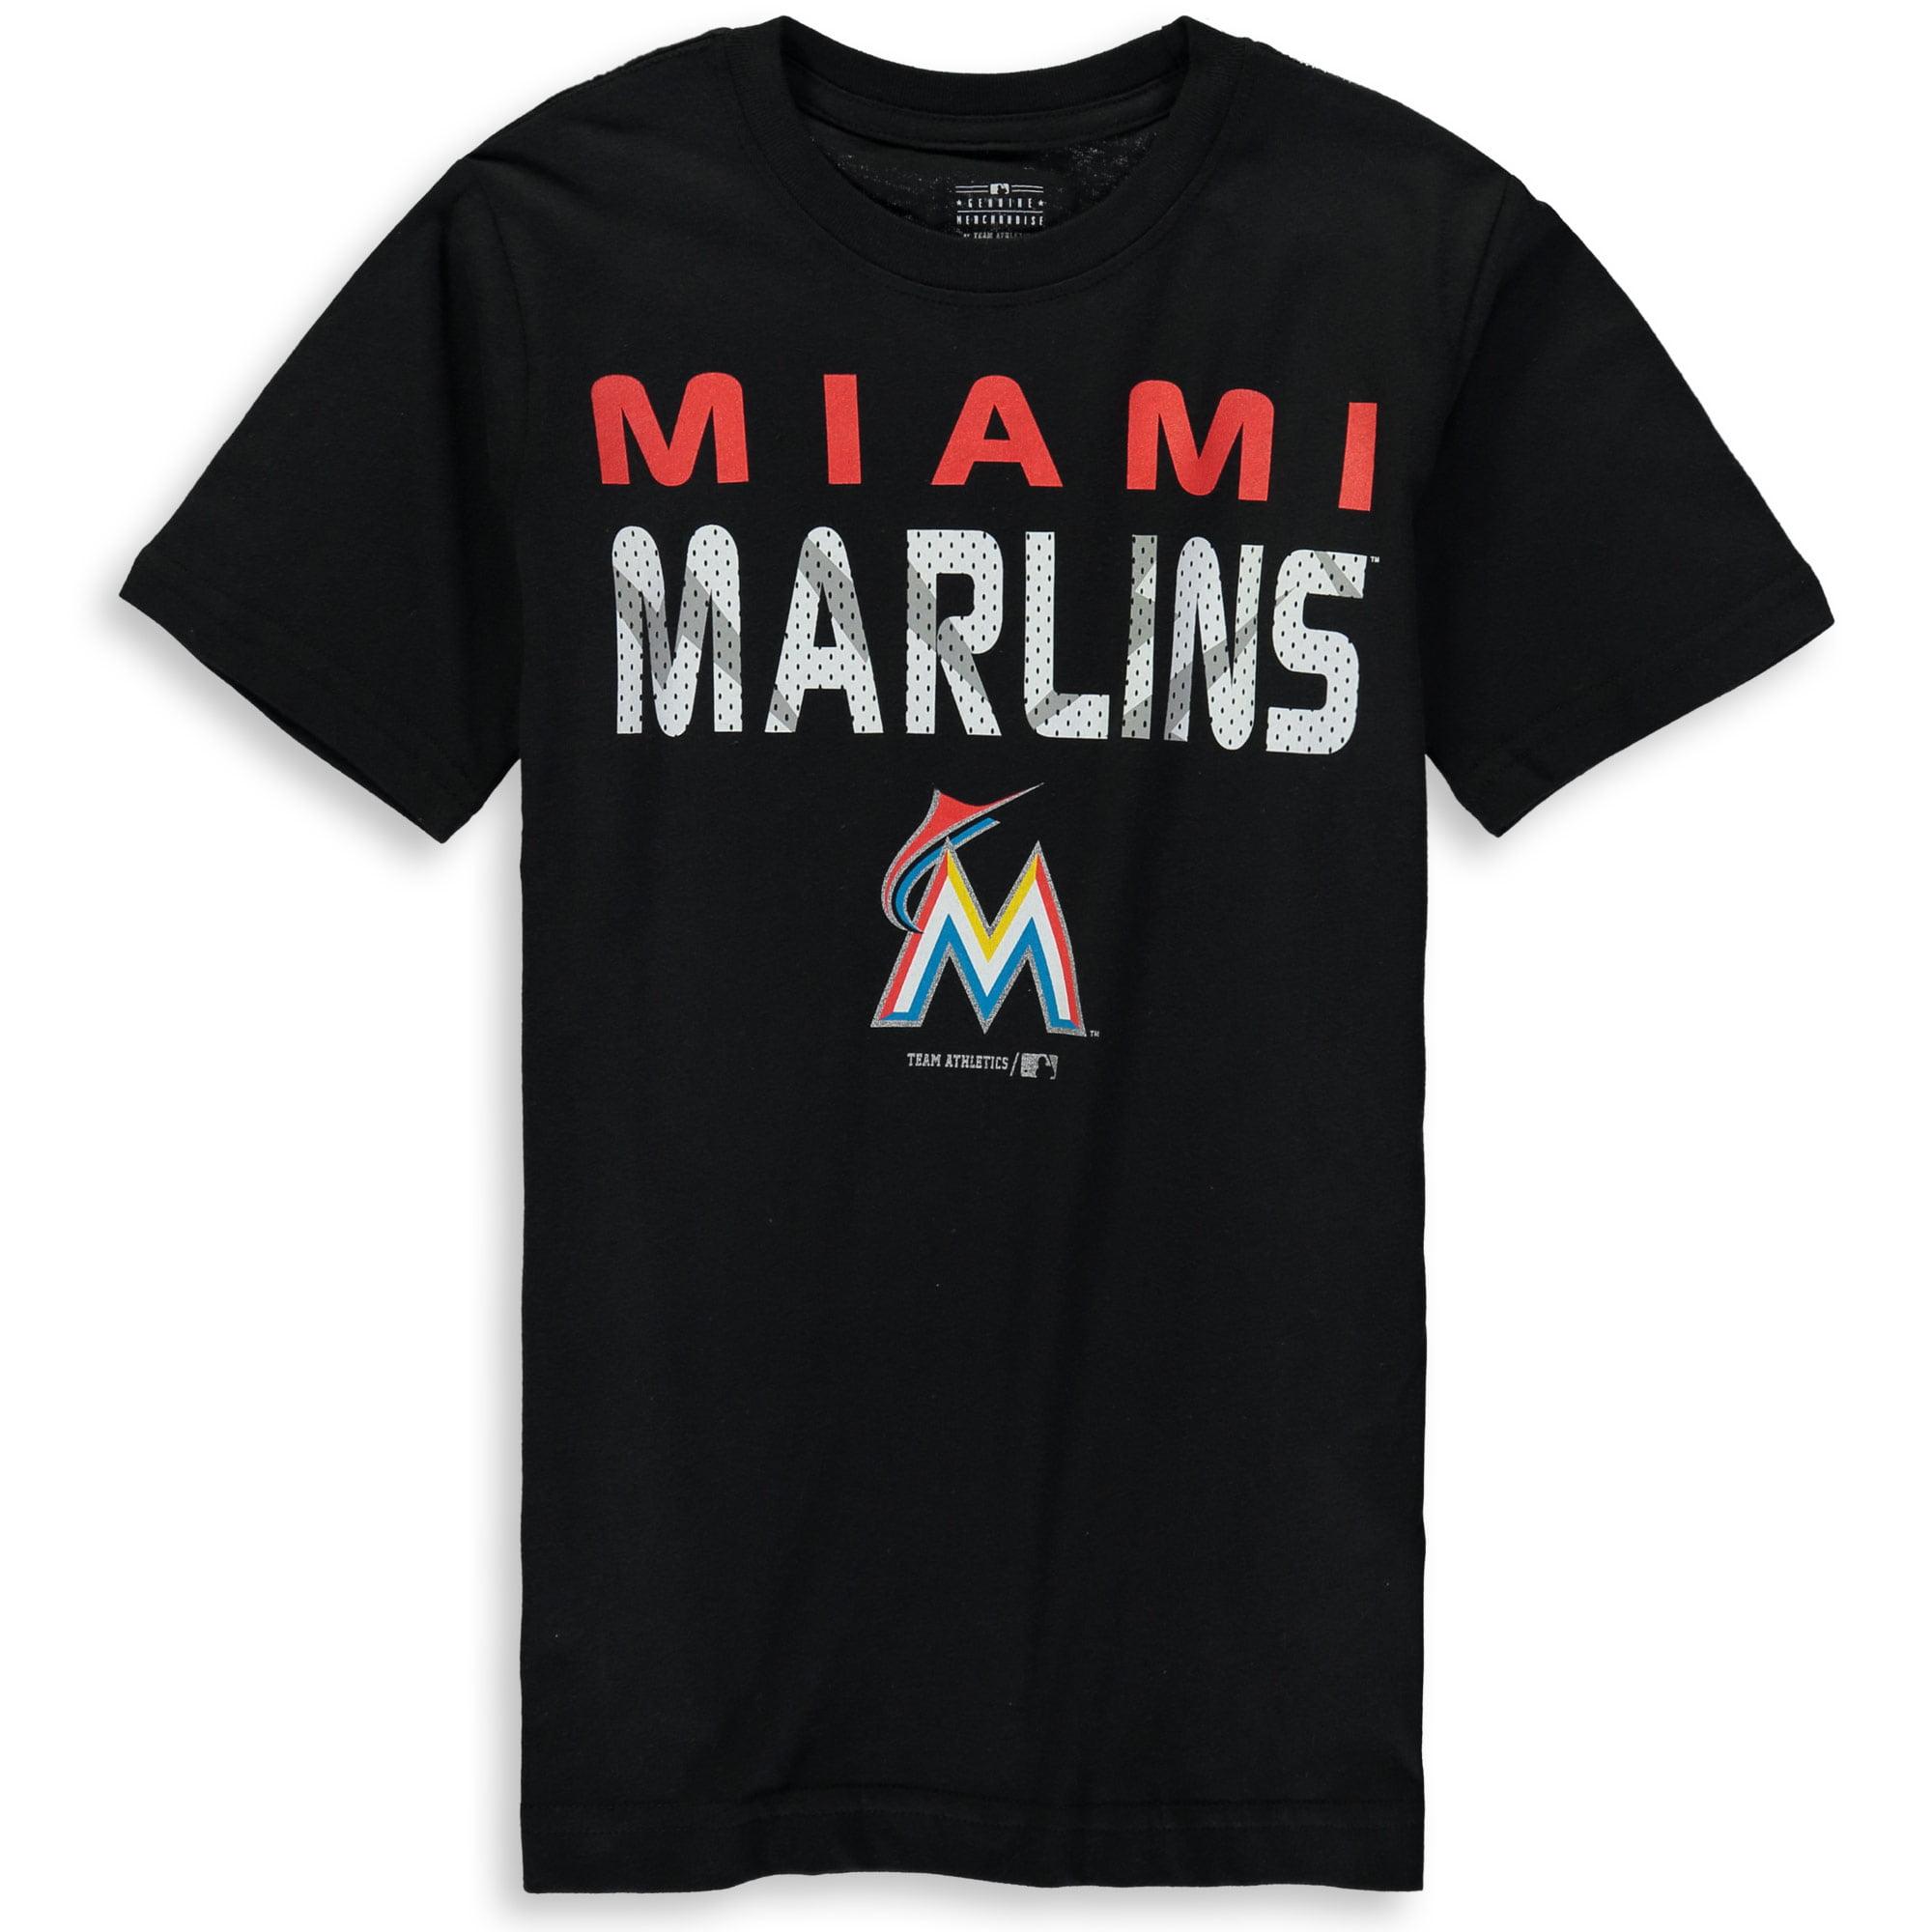 MLB Miami MARLINS TEE Short Sleeve Boys Team Name and LOGO 100% Cotton Team Color 4-18